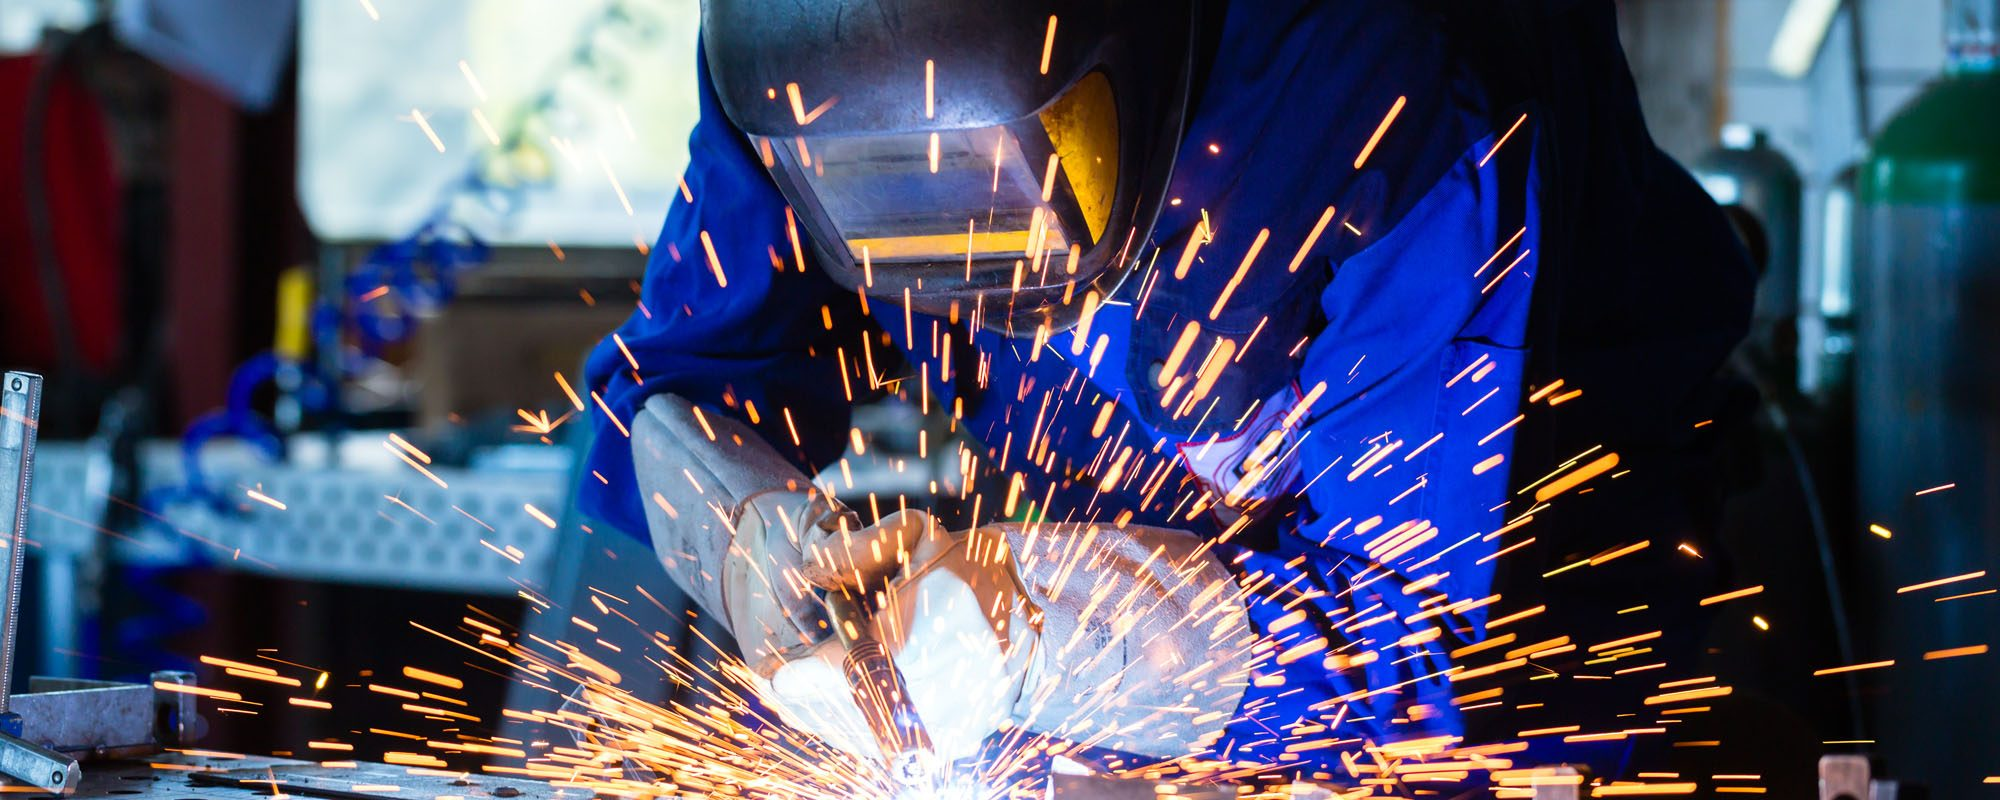 Welder bonding metal with welding device in workshop, lots of sparks to be seen, he wears welding goggles